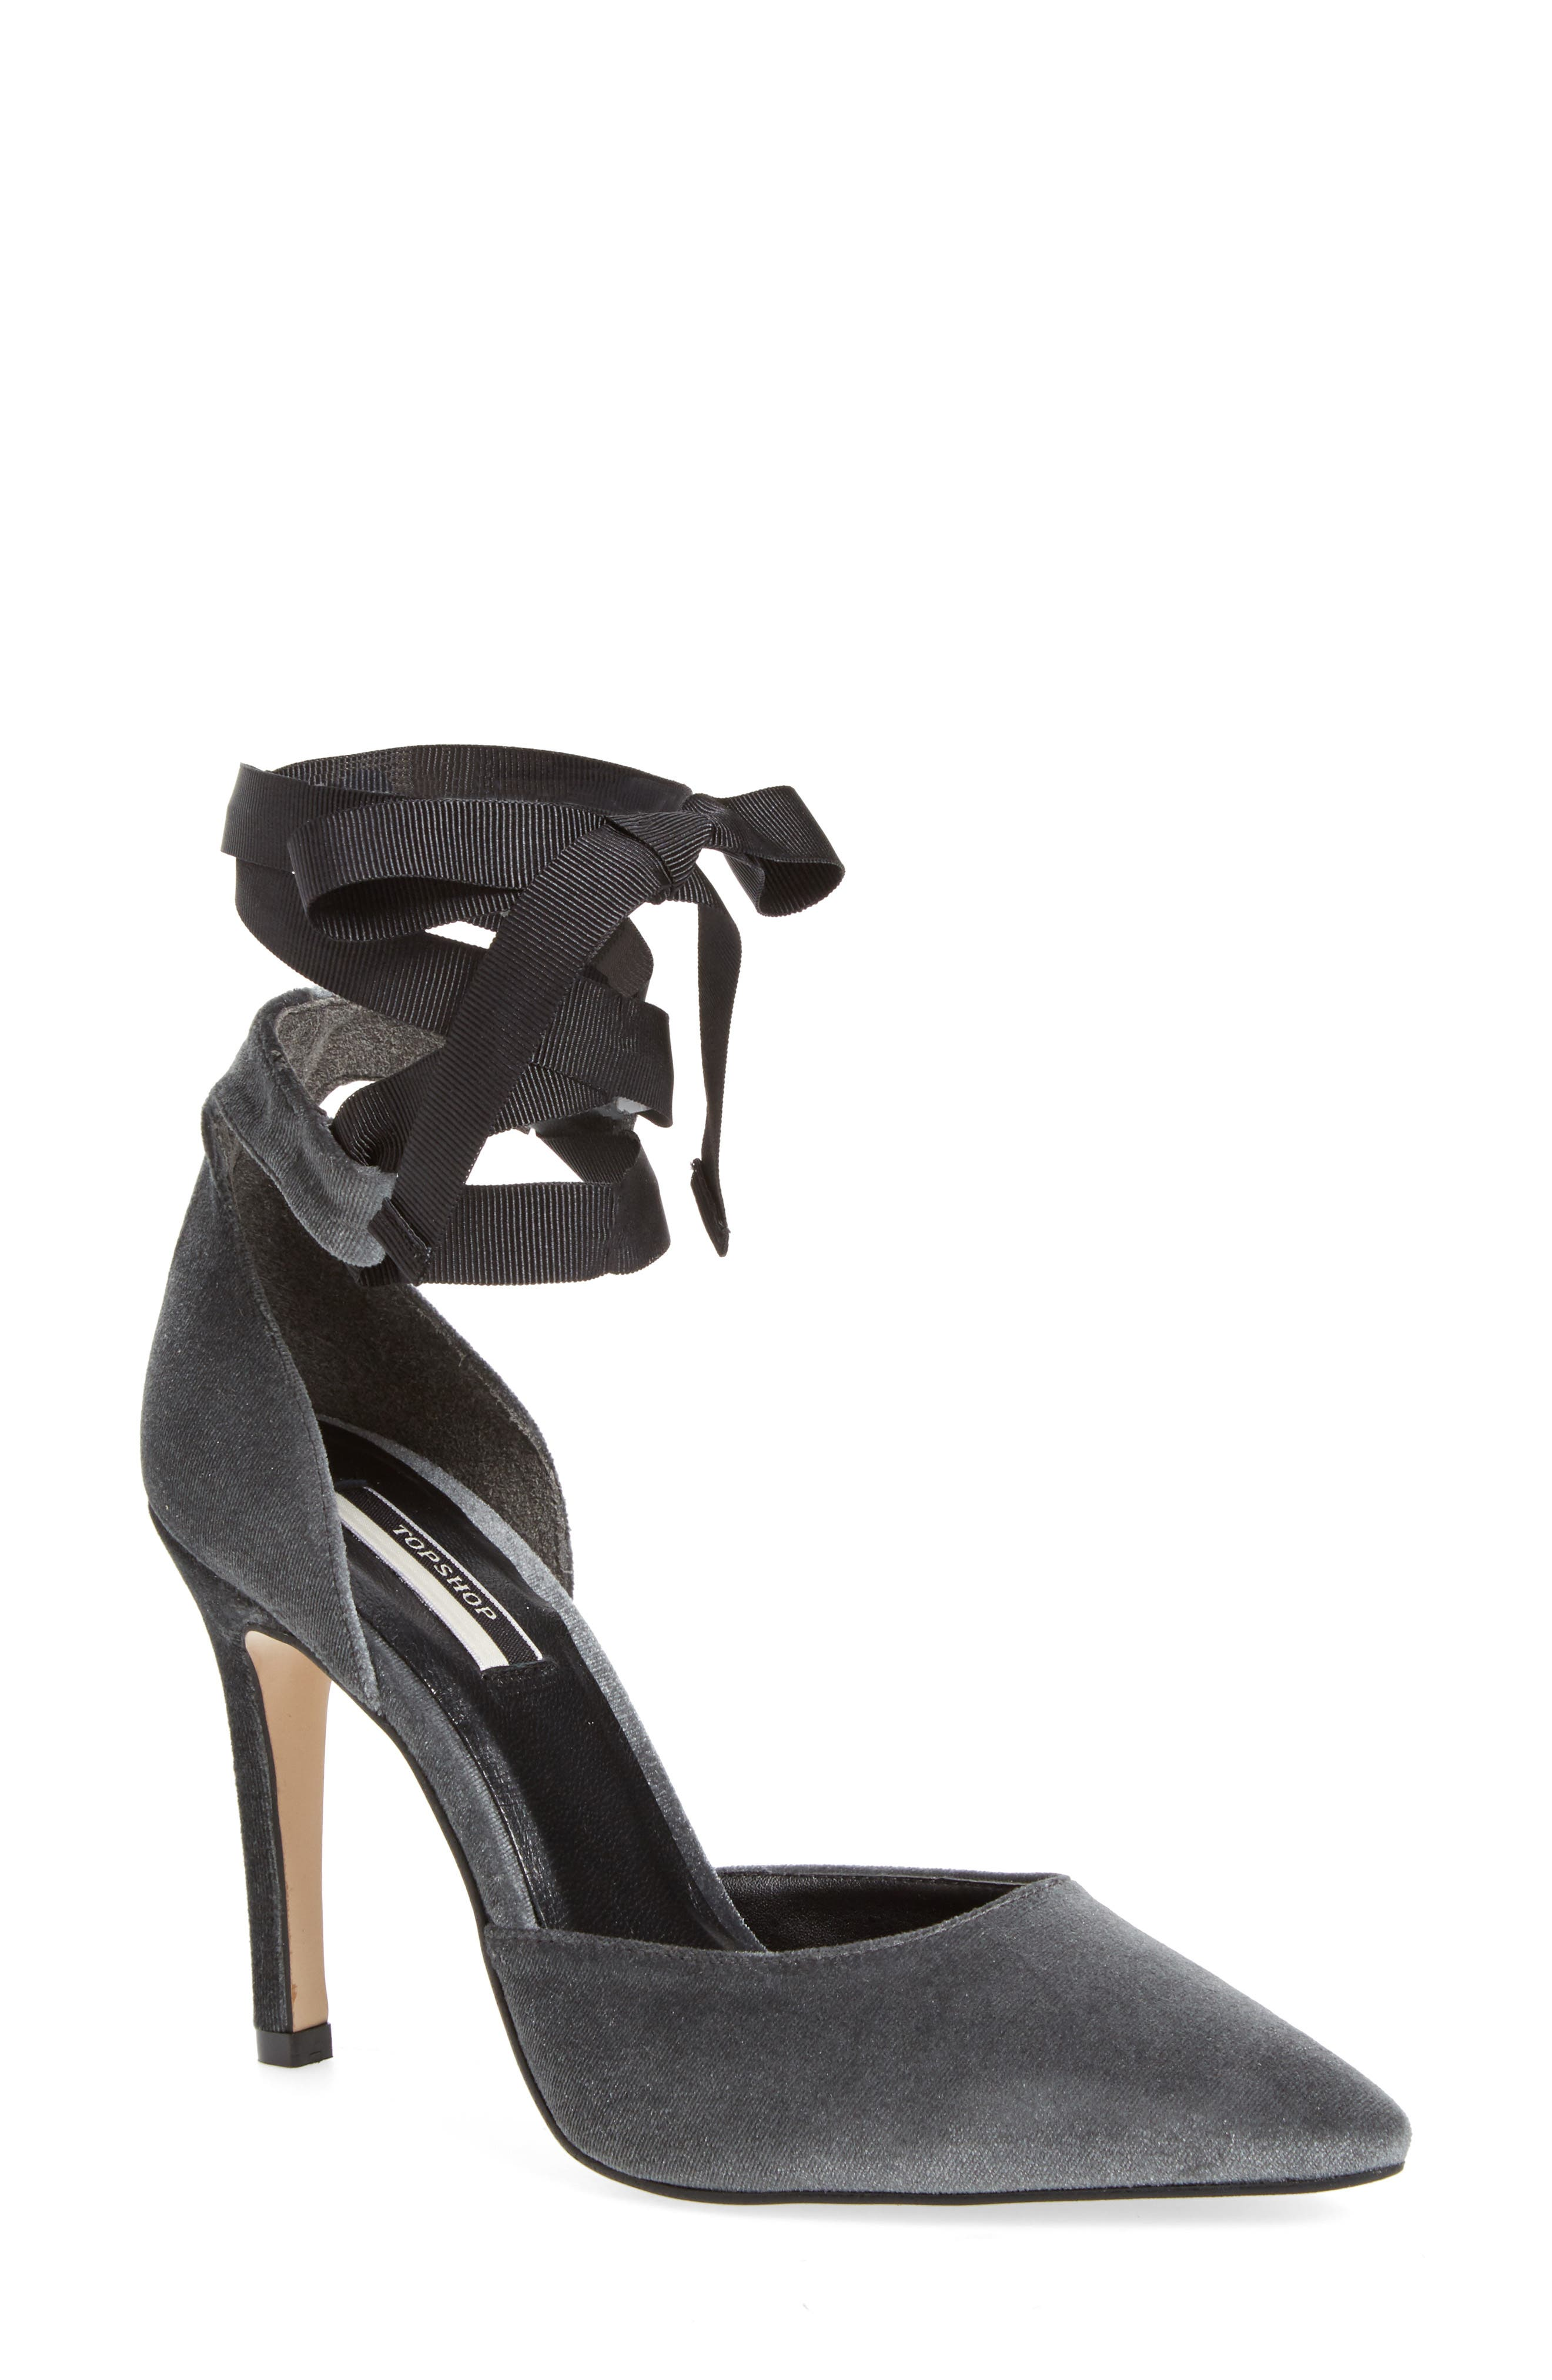 Alternate Image 1 Selected - Topshop Graceful Ankle Tie d'Orsay Pump (Women)